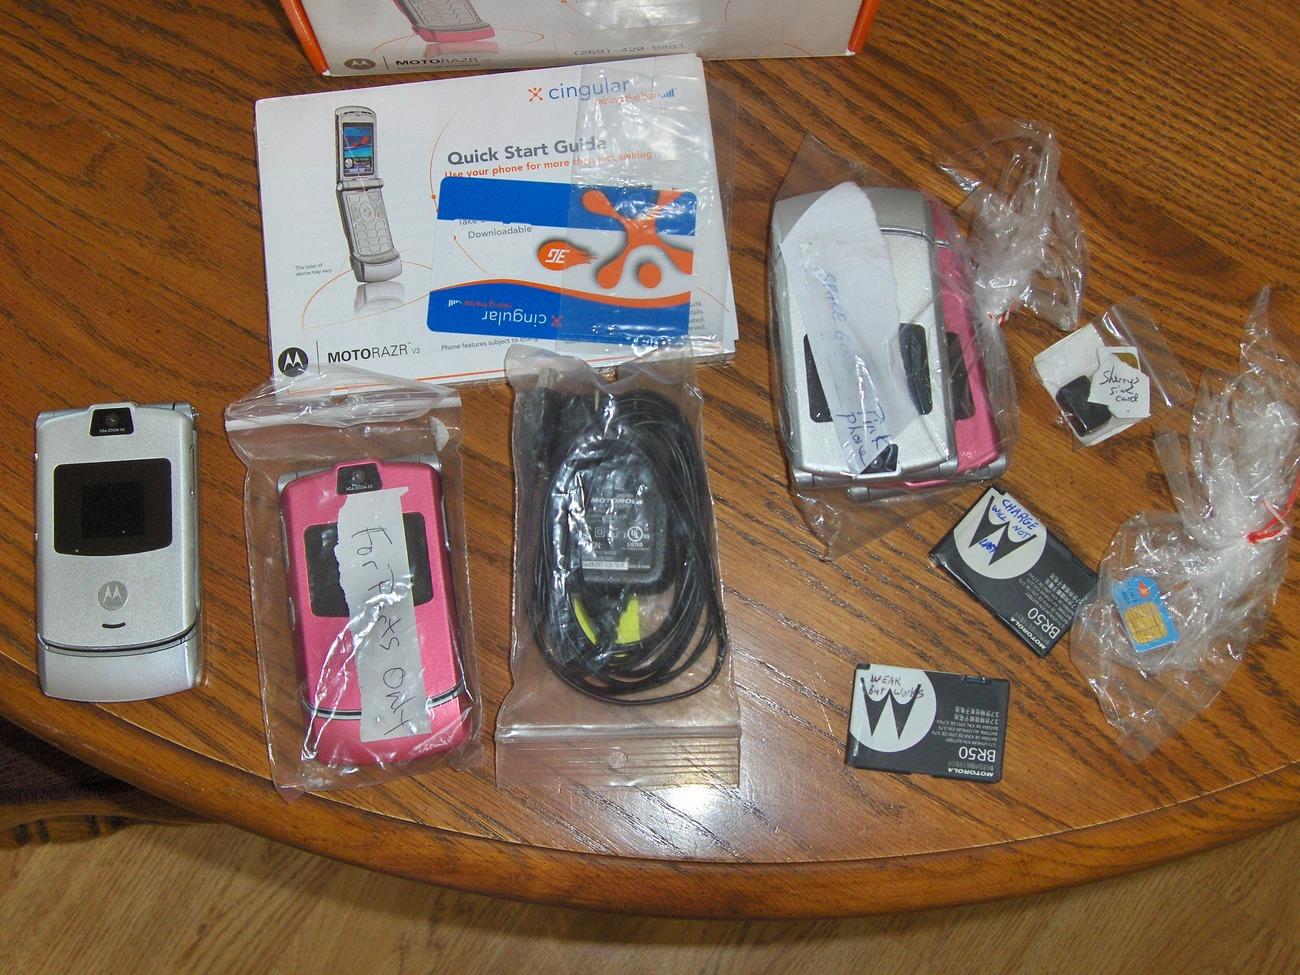 Motorola Razr Phones Parts & Case Replacements